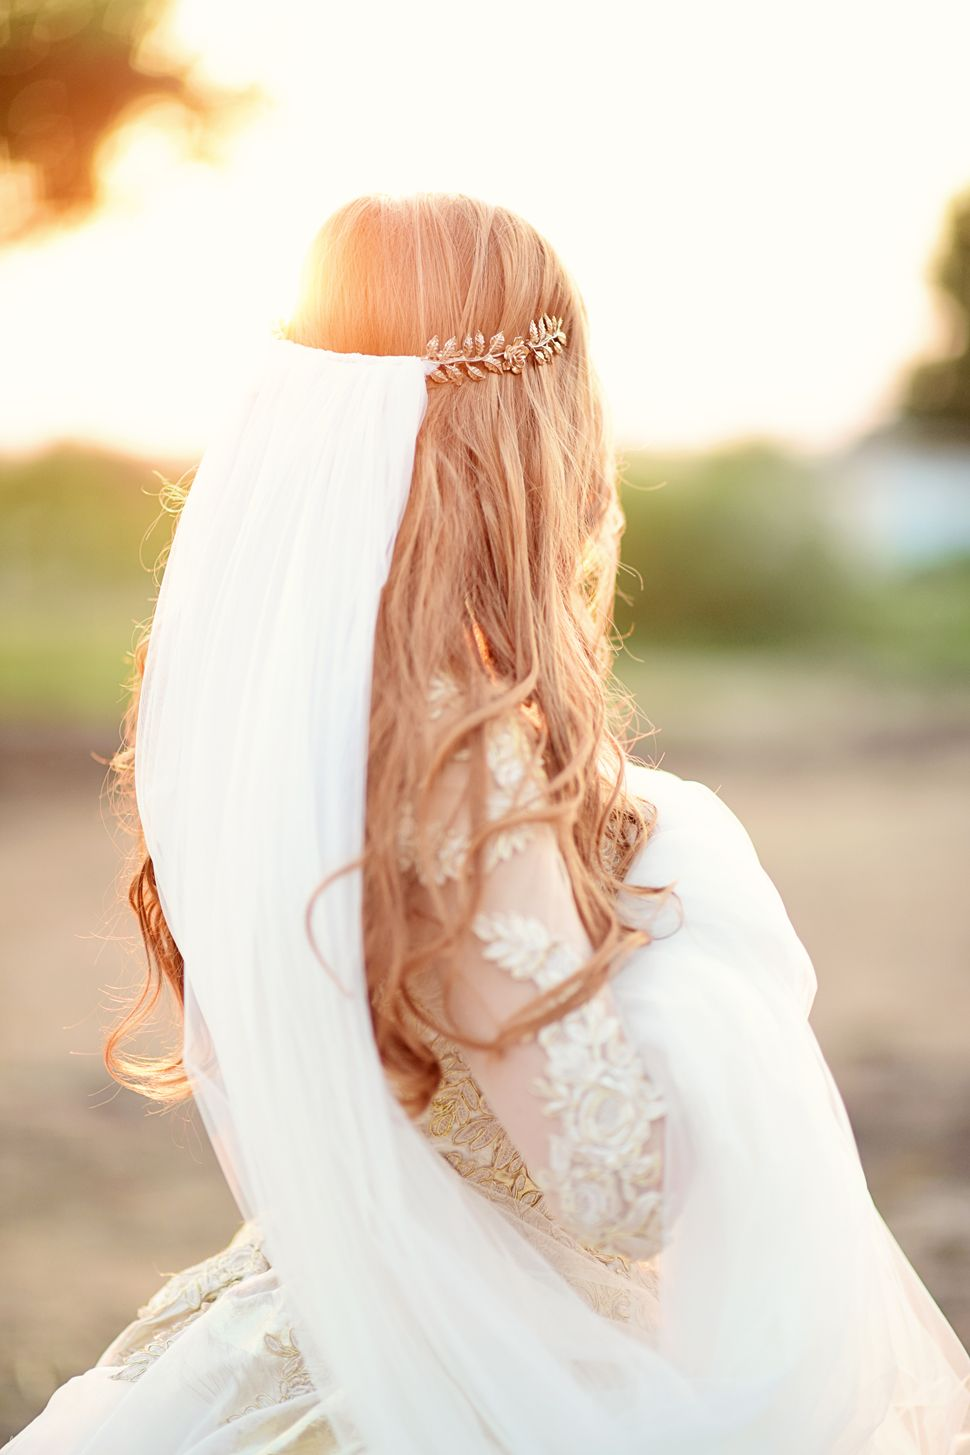 Beautiful wedding. Royal wedding dress. Royal veil.